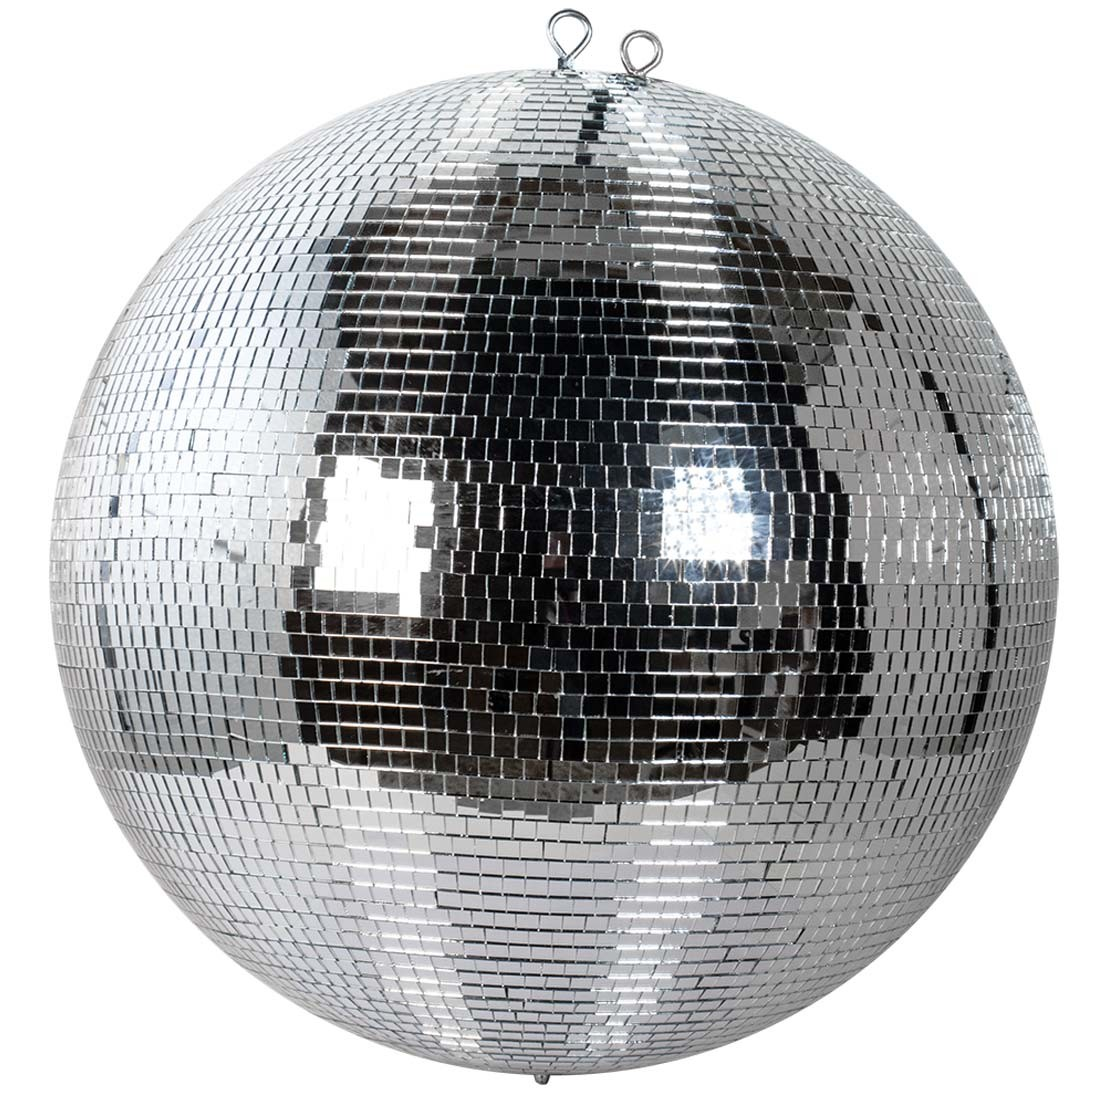 Mirrorball 1m M 4040 Mirrorballs Lights Products